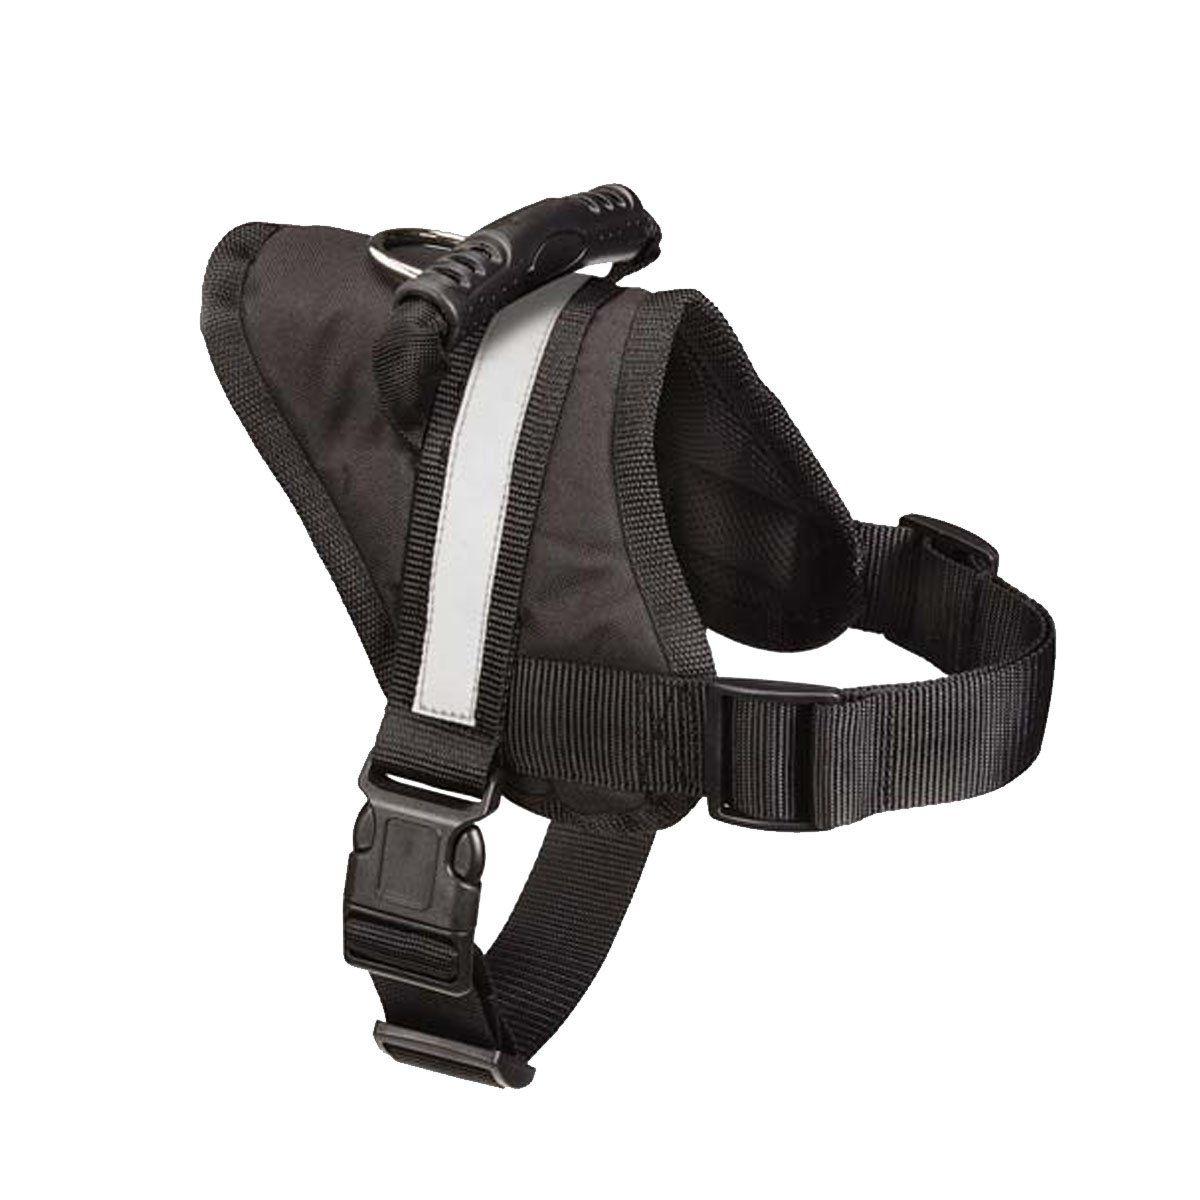 Big Dog Harness Soft Reflective No Pull Black Size L 2636